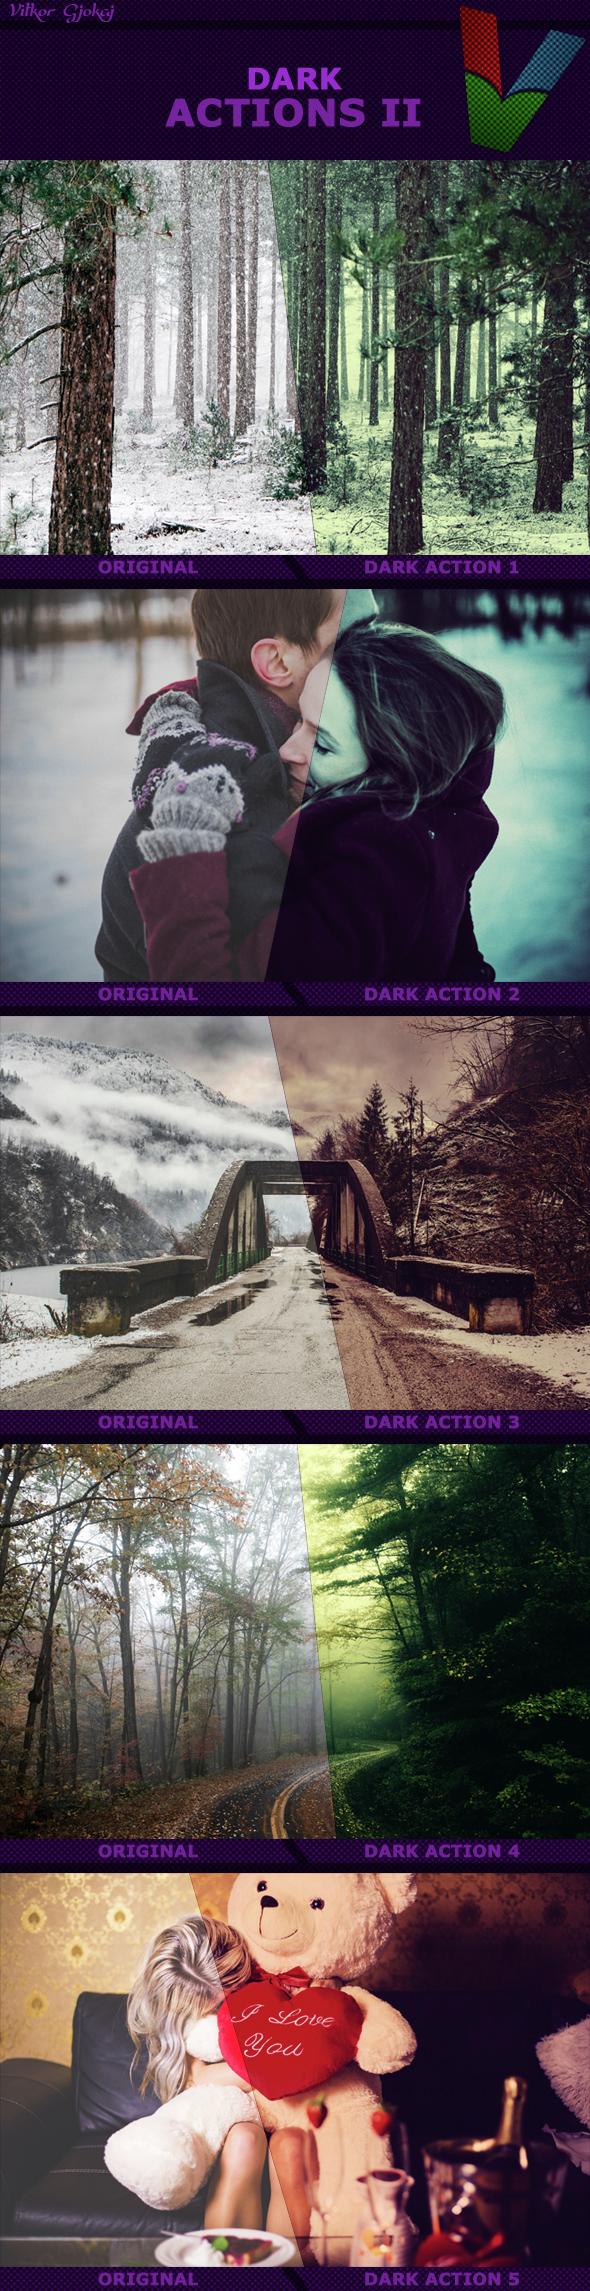 Dark Actions II - Photo Effects Actions